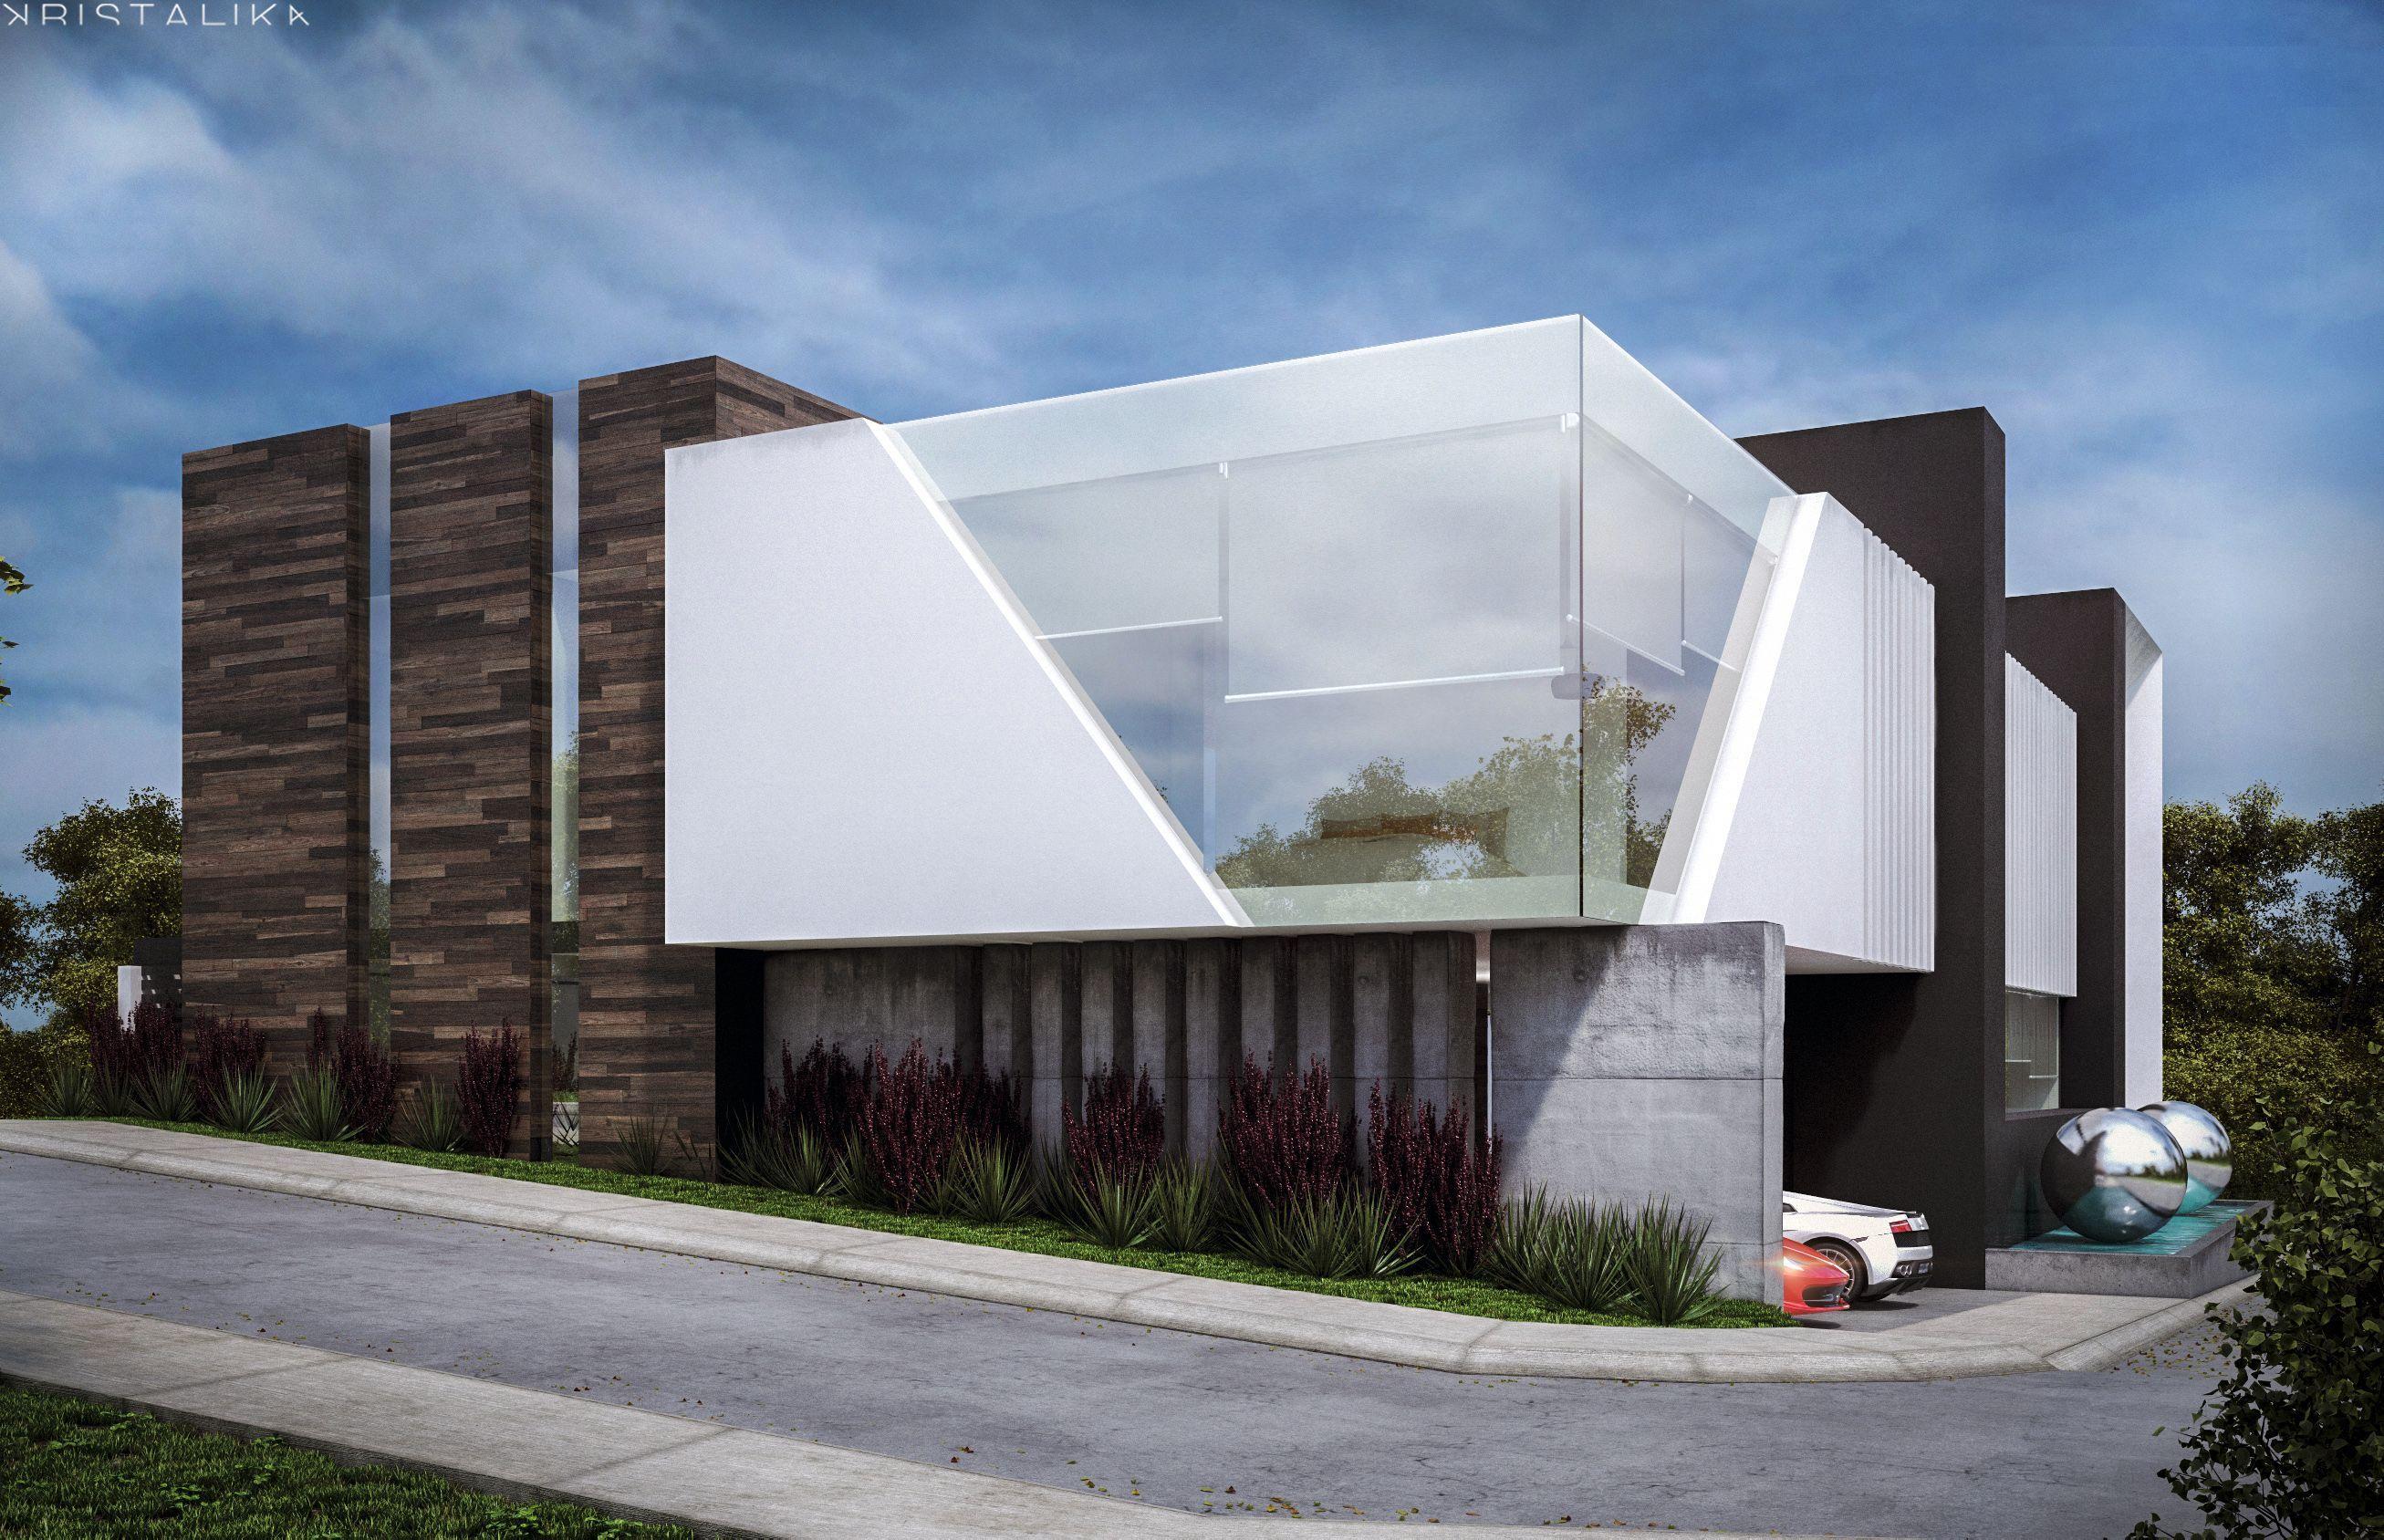 Rio dee house fachadas minimalistas pinterest for Fachadas oficinas minimalistas